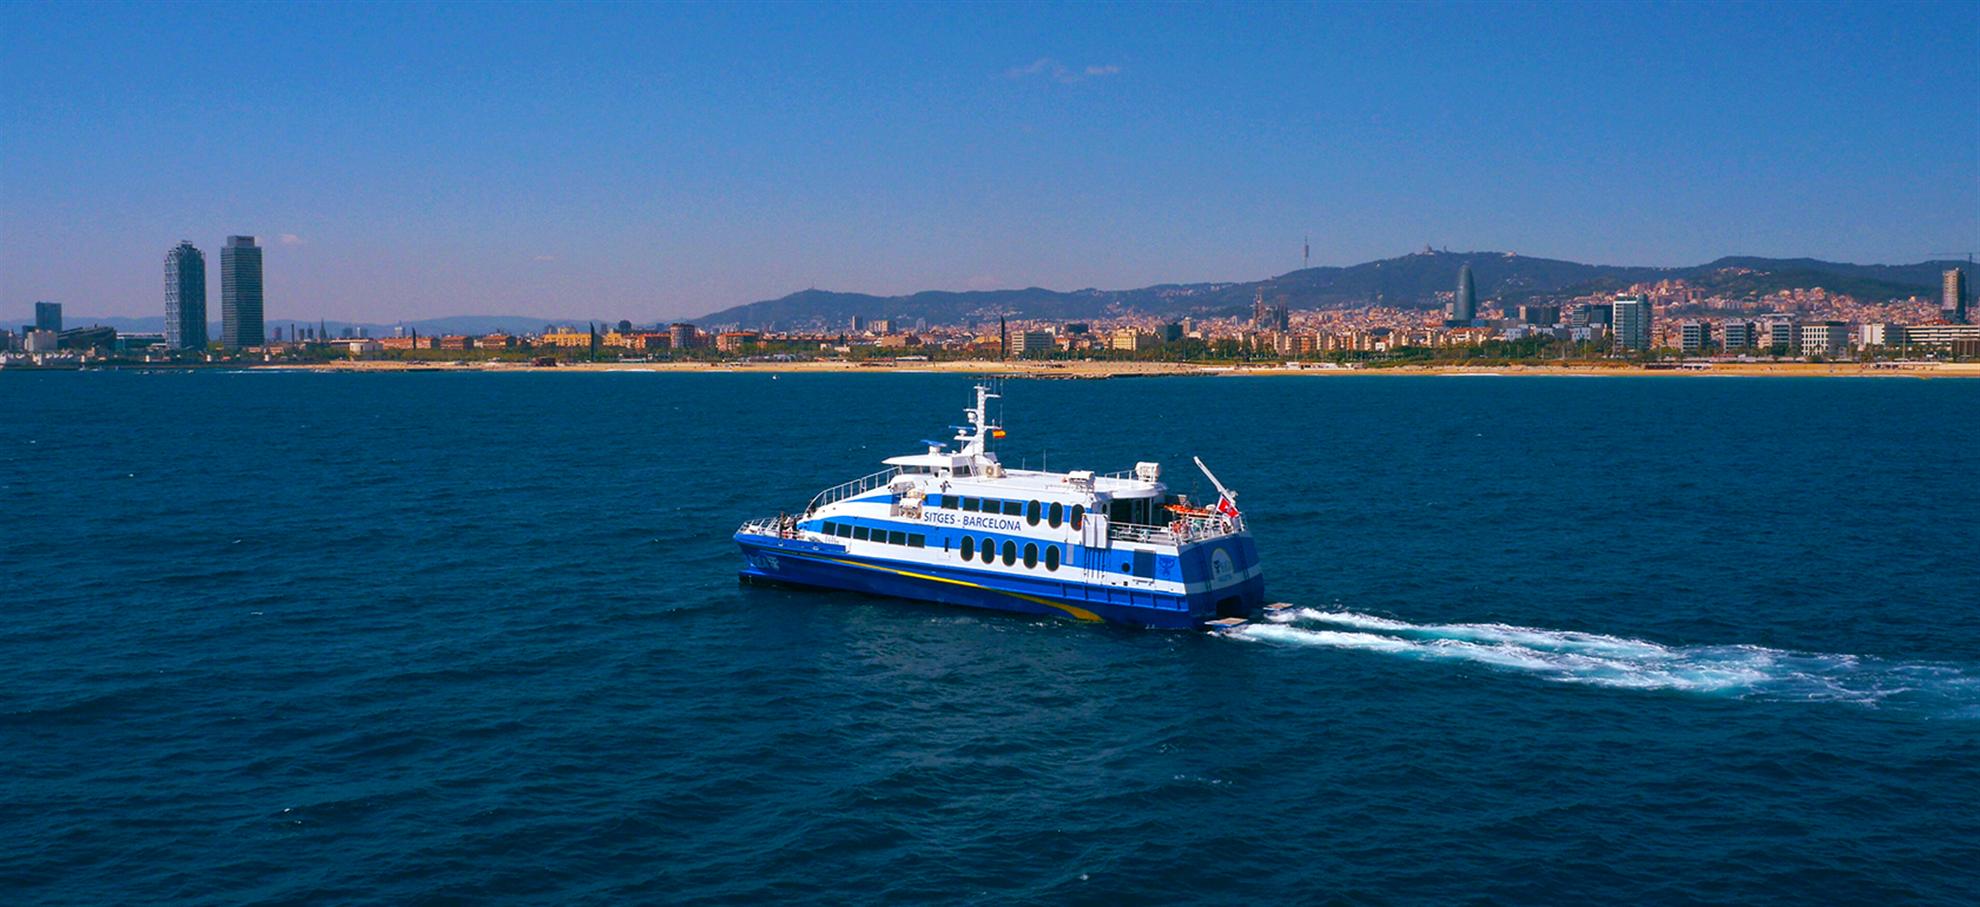 Ingressos de Ferry de Barcelona para Sitges!